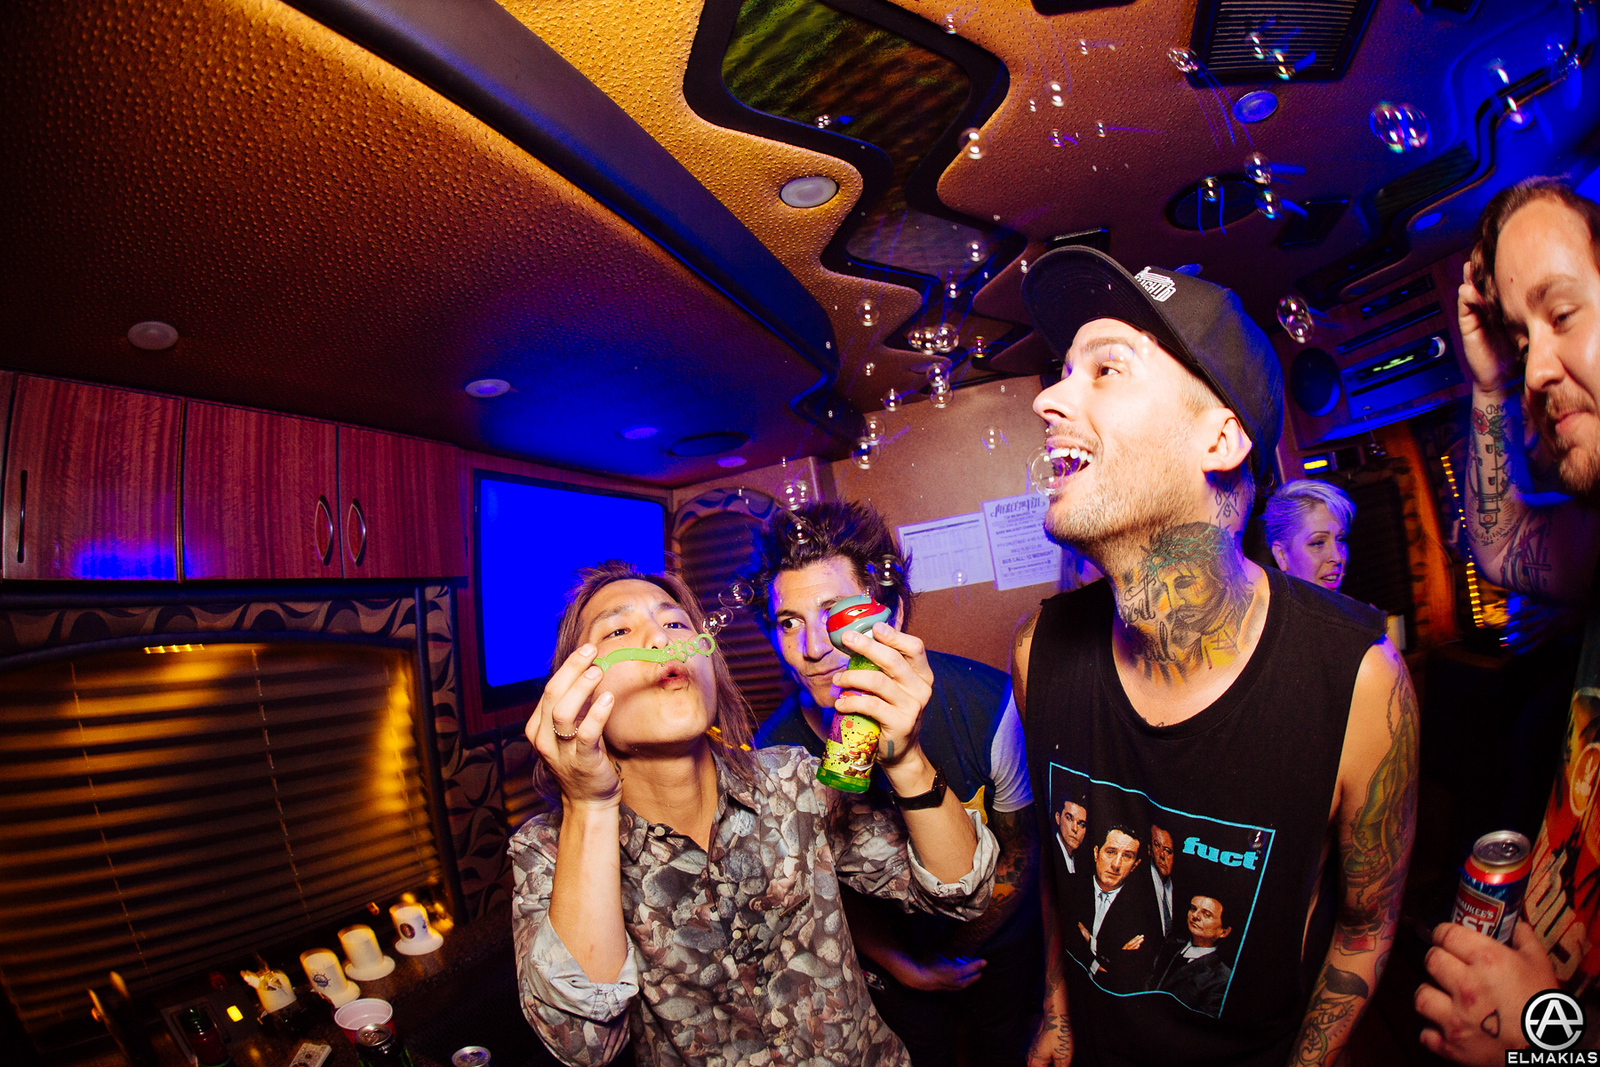 Pierce the Veil at Warped Tour 2015 by Adam Elmakias